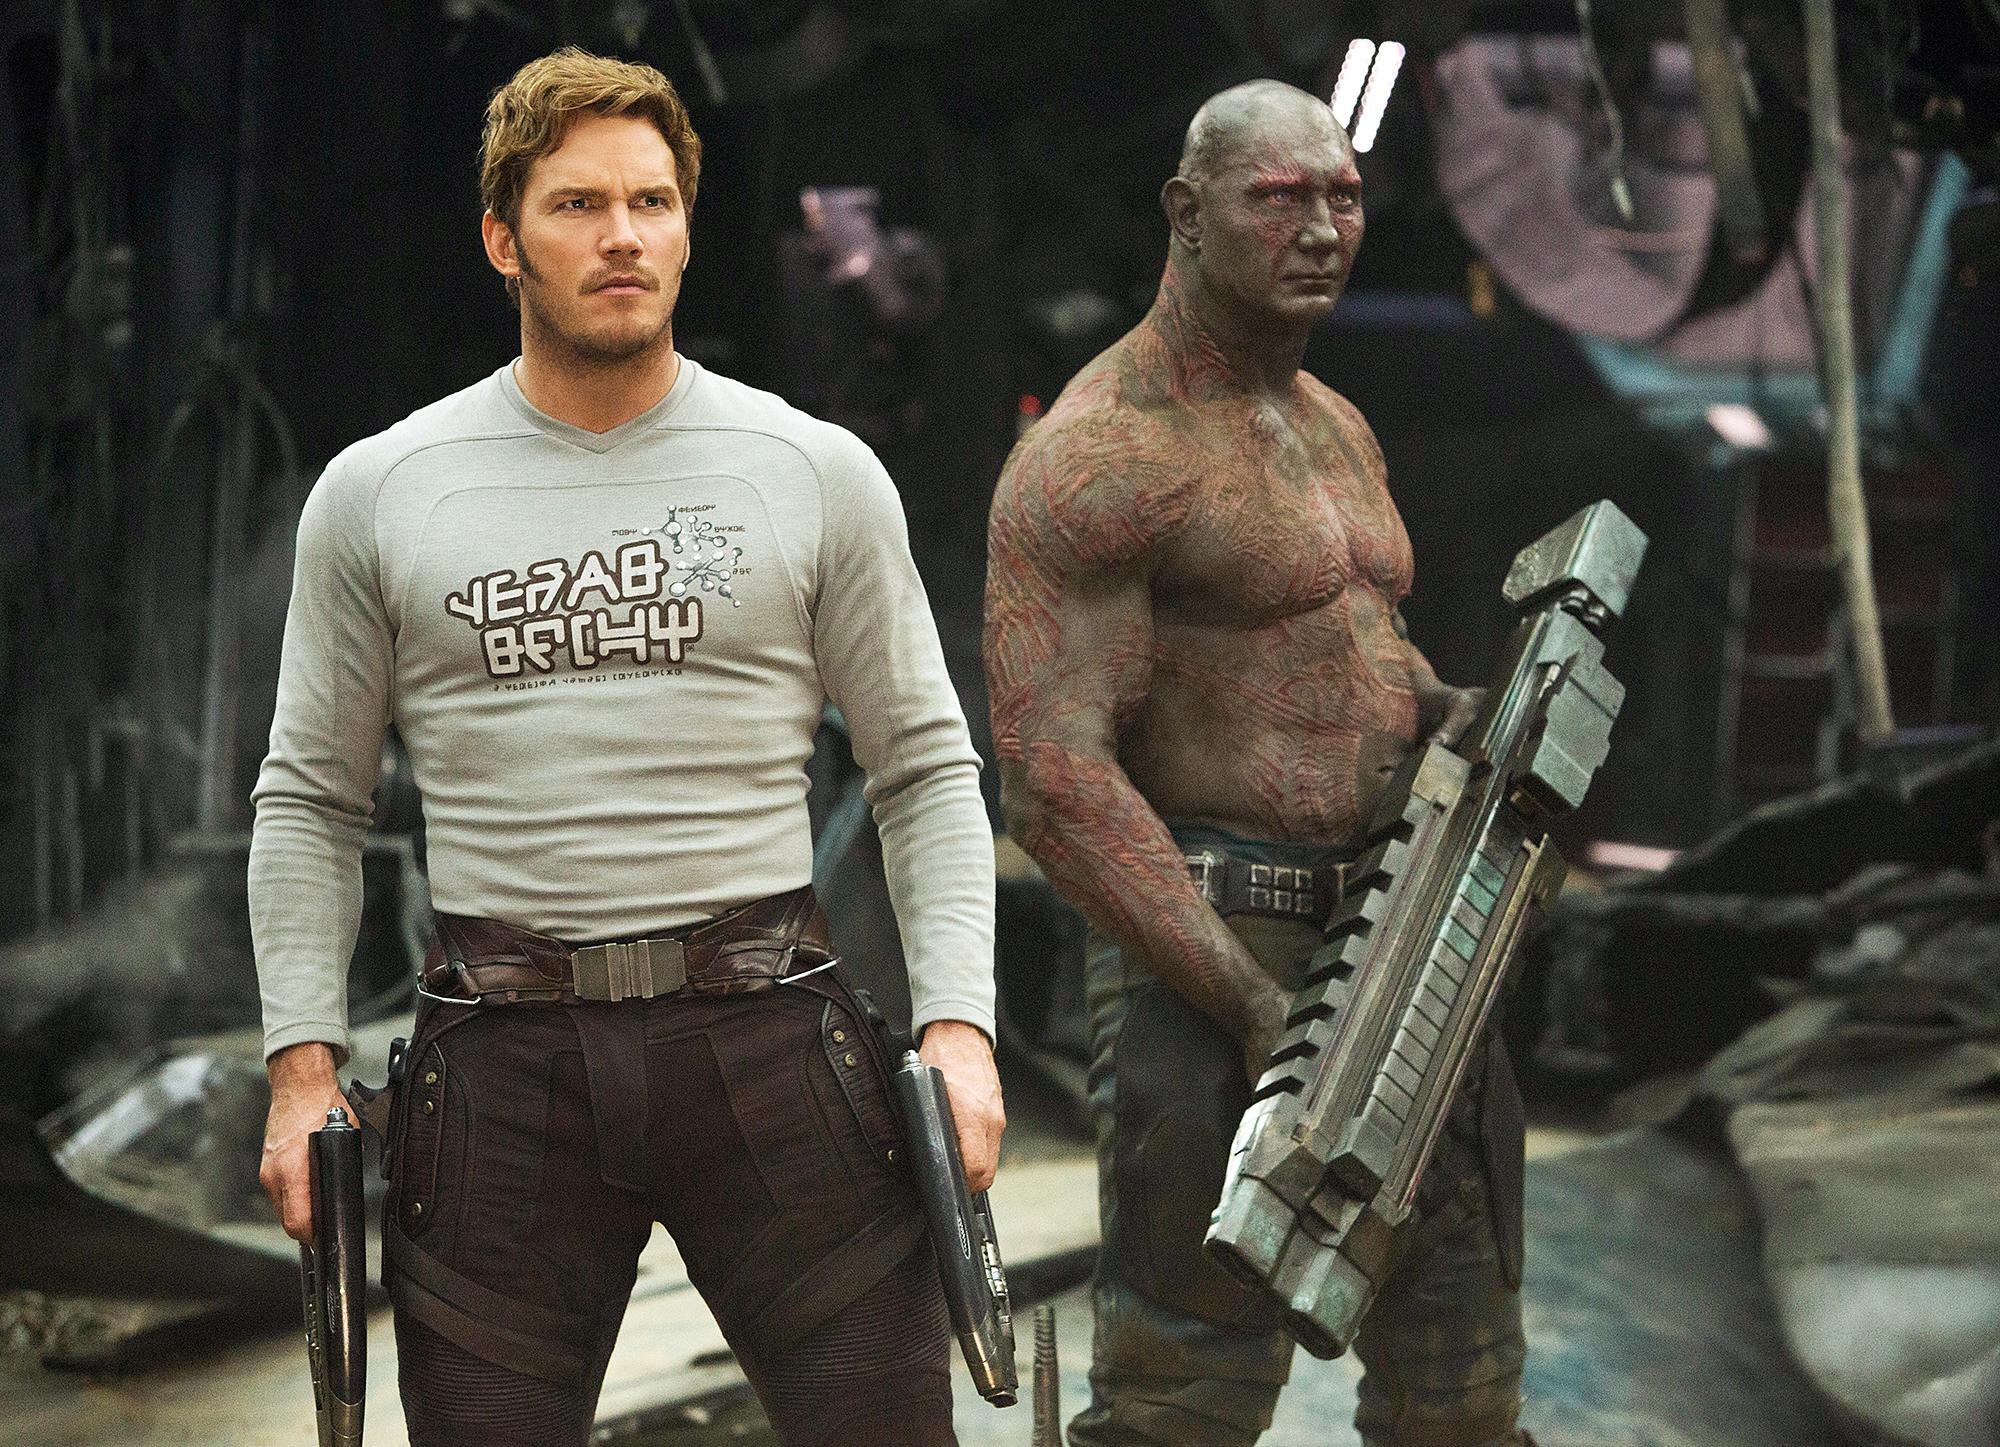 Chris Pratt Dave Bautista 'Guardians Of The Galaxy Vol 2